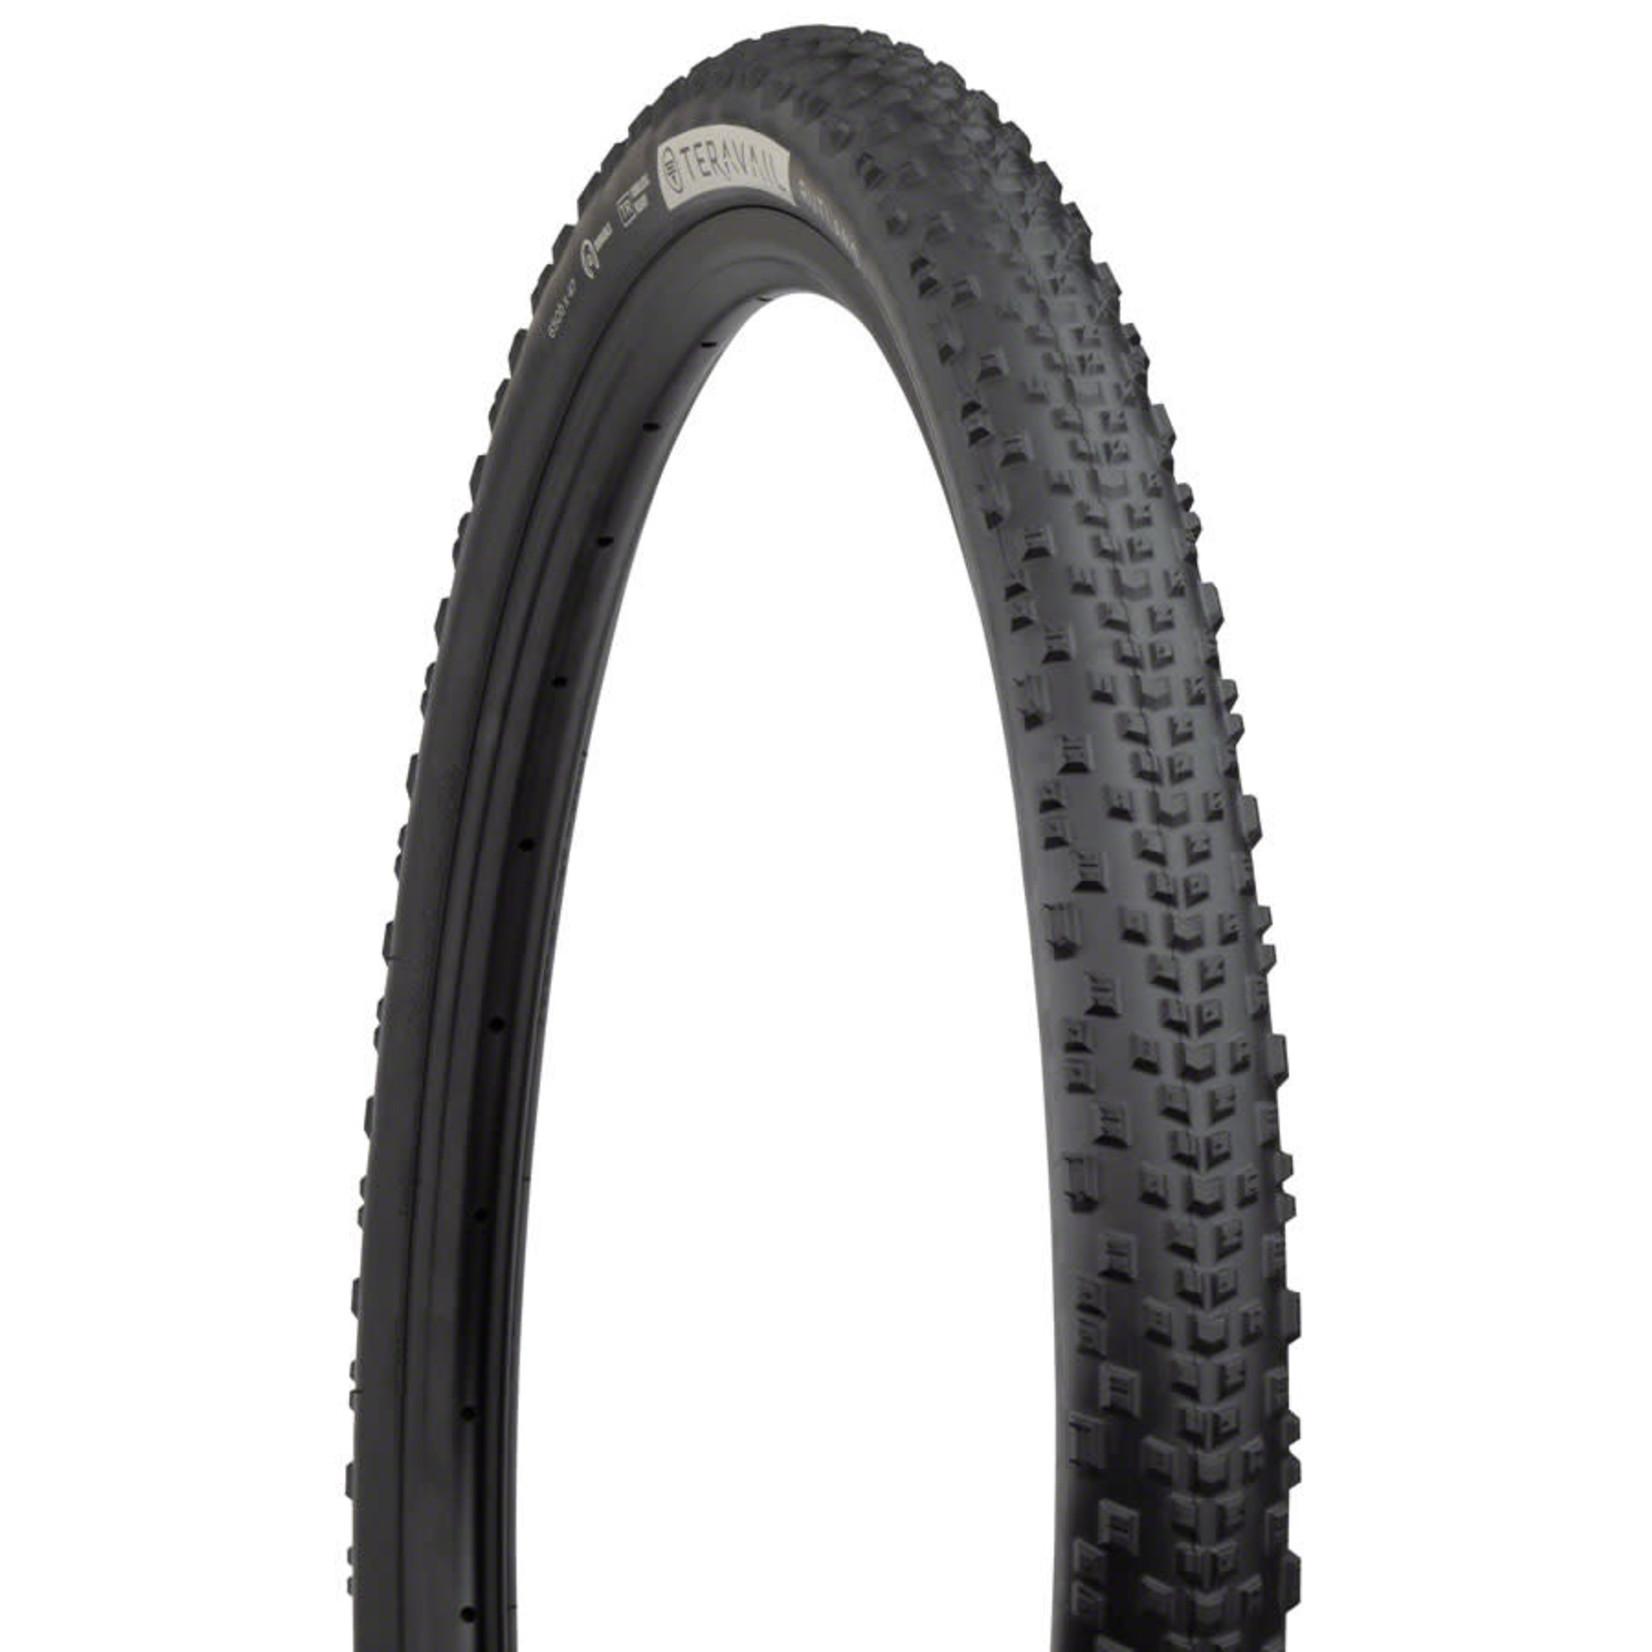 Teravail Teravail Rutland Tire - 650 x 47, Tubeless, Folding, Black, Light and Supple